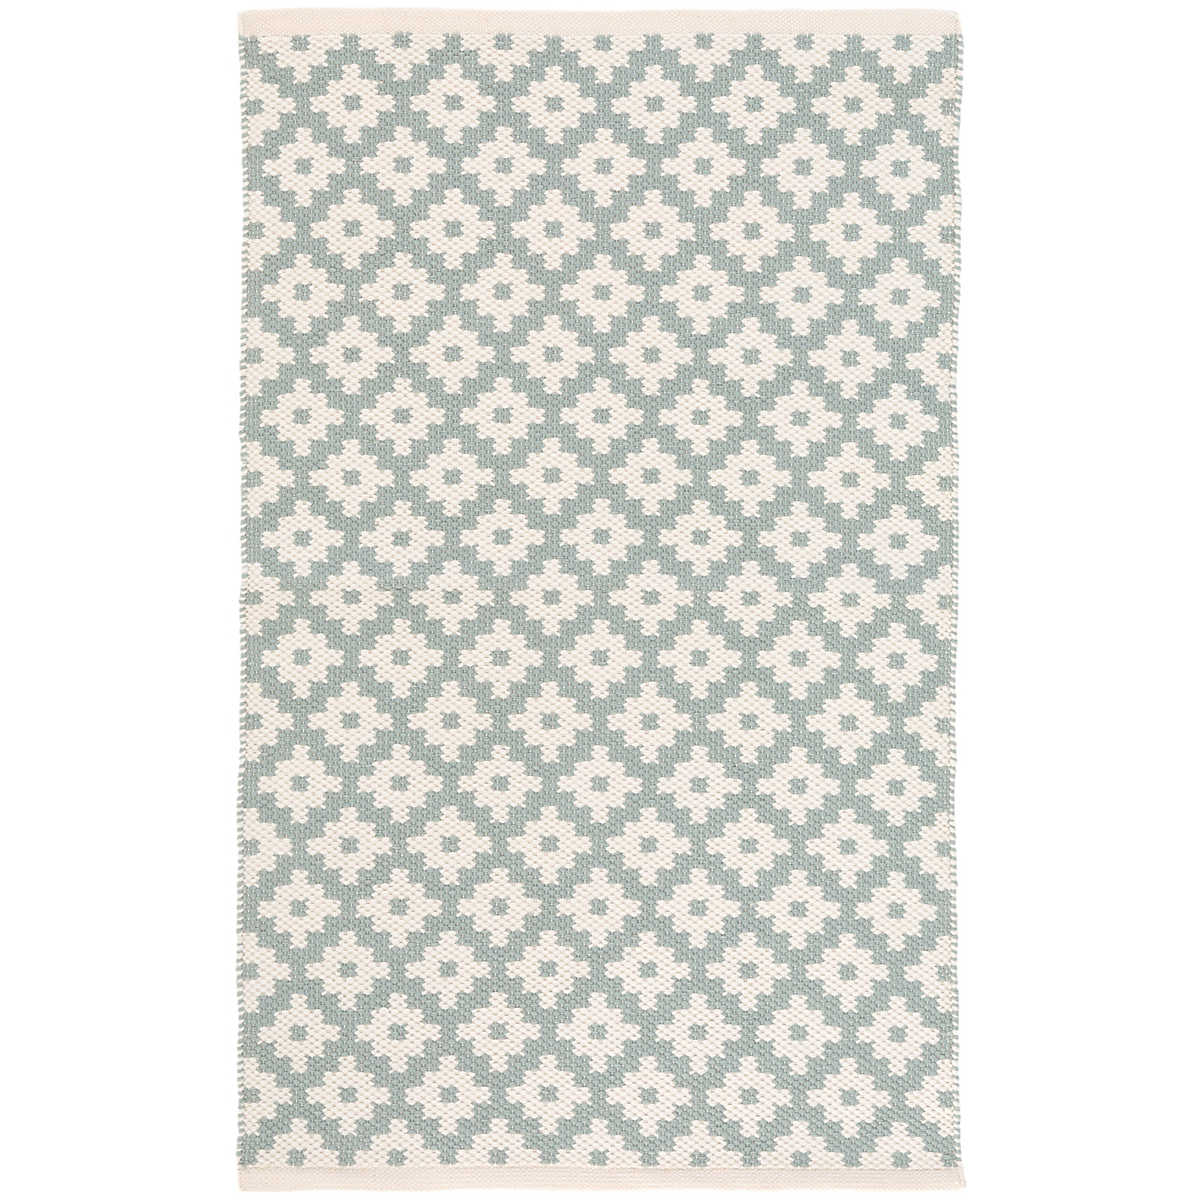 Samode light blue ivory indoor outdoor rug dash albert for Blue indoor outdoor rug